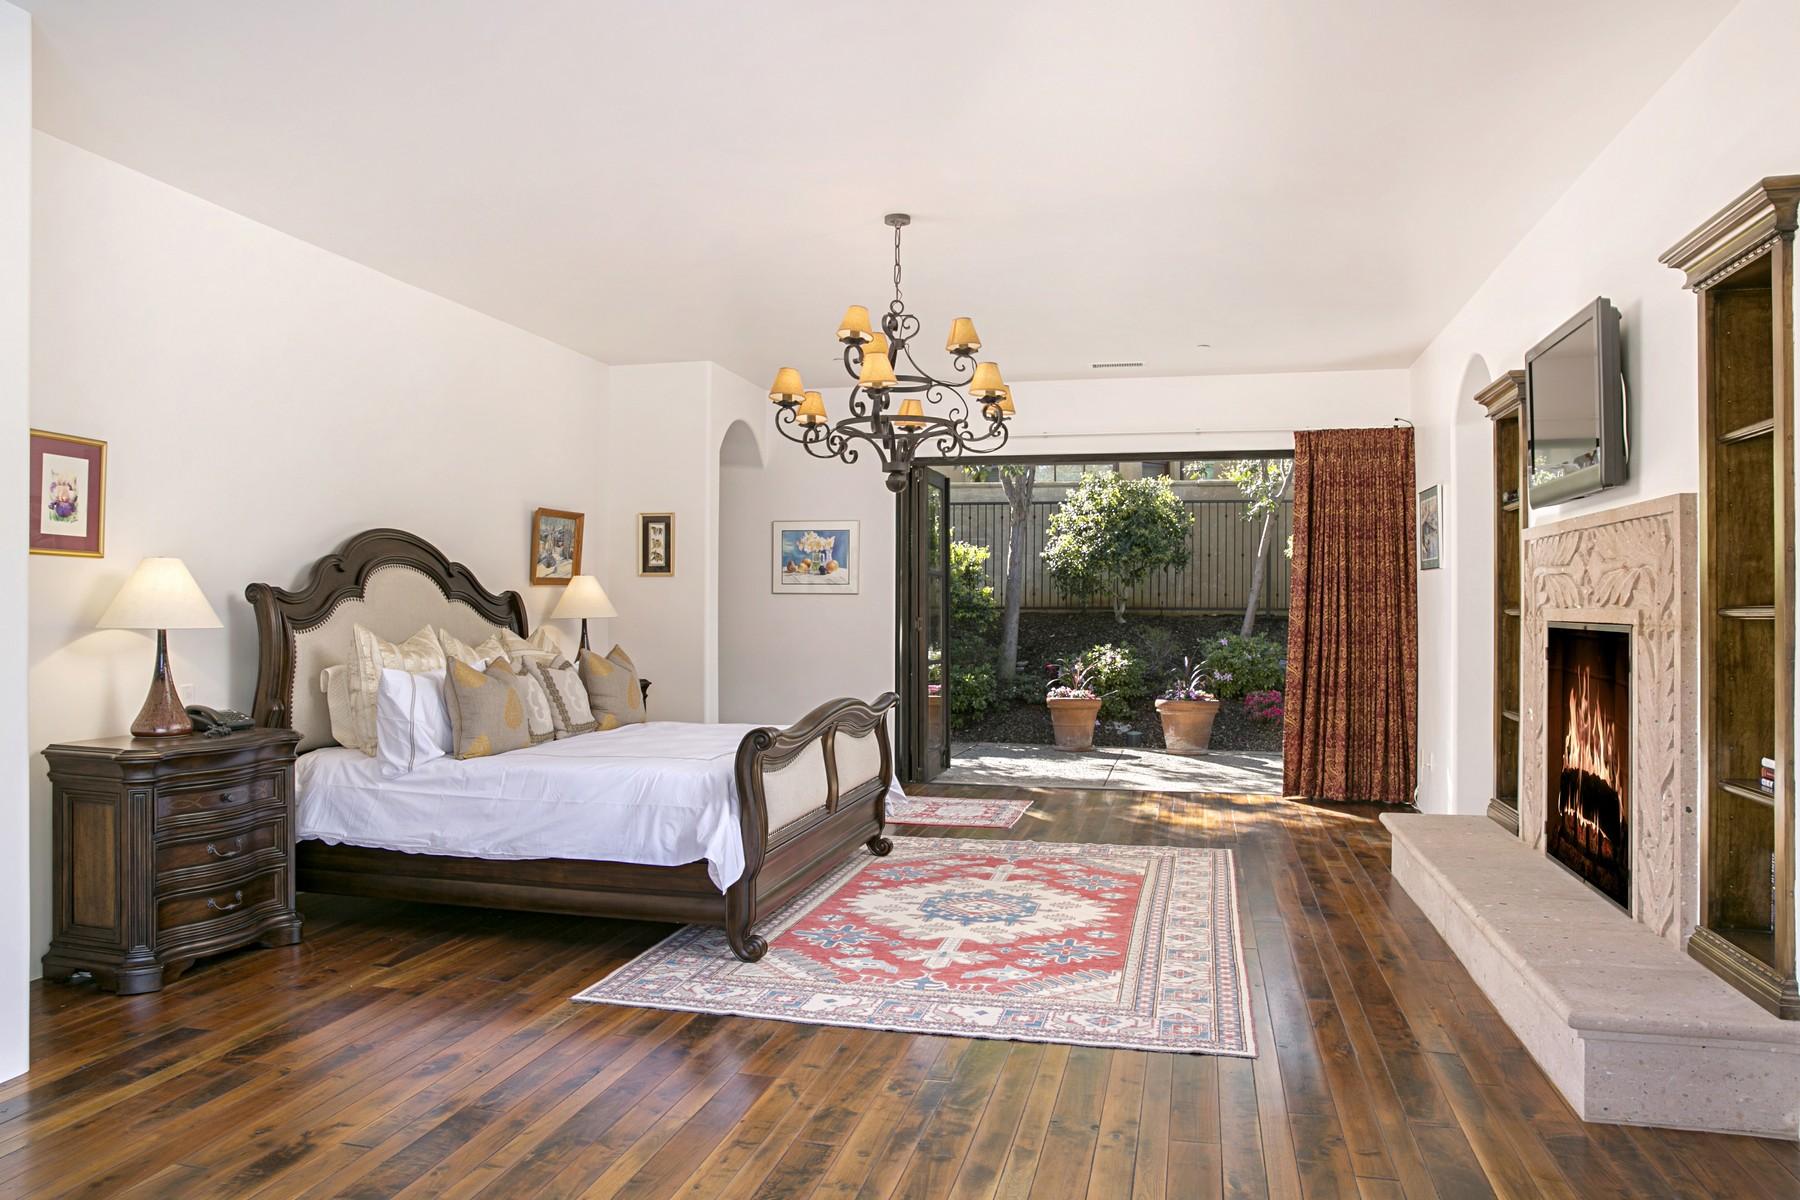 Additional photo for property listing at 18484 Calle La Serra  Rancho Santa Fe, Калифорния 92067 Соединенные Штаты